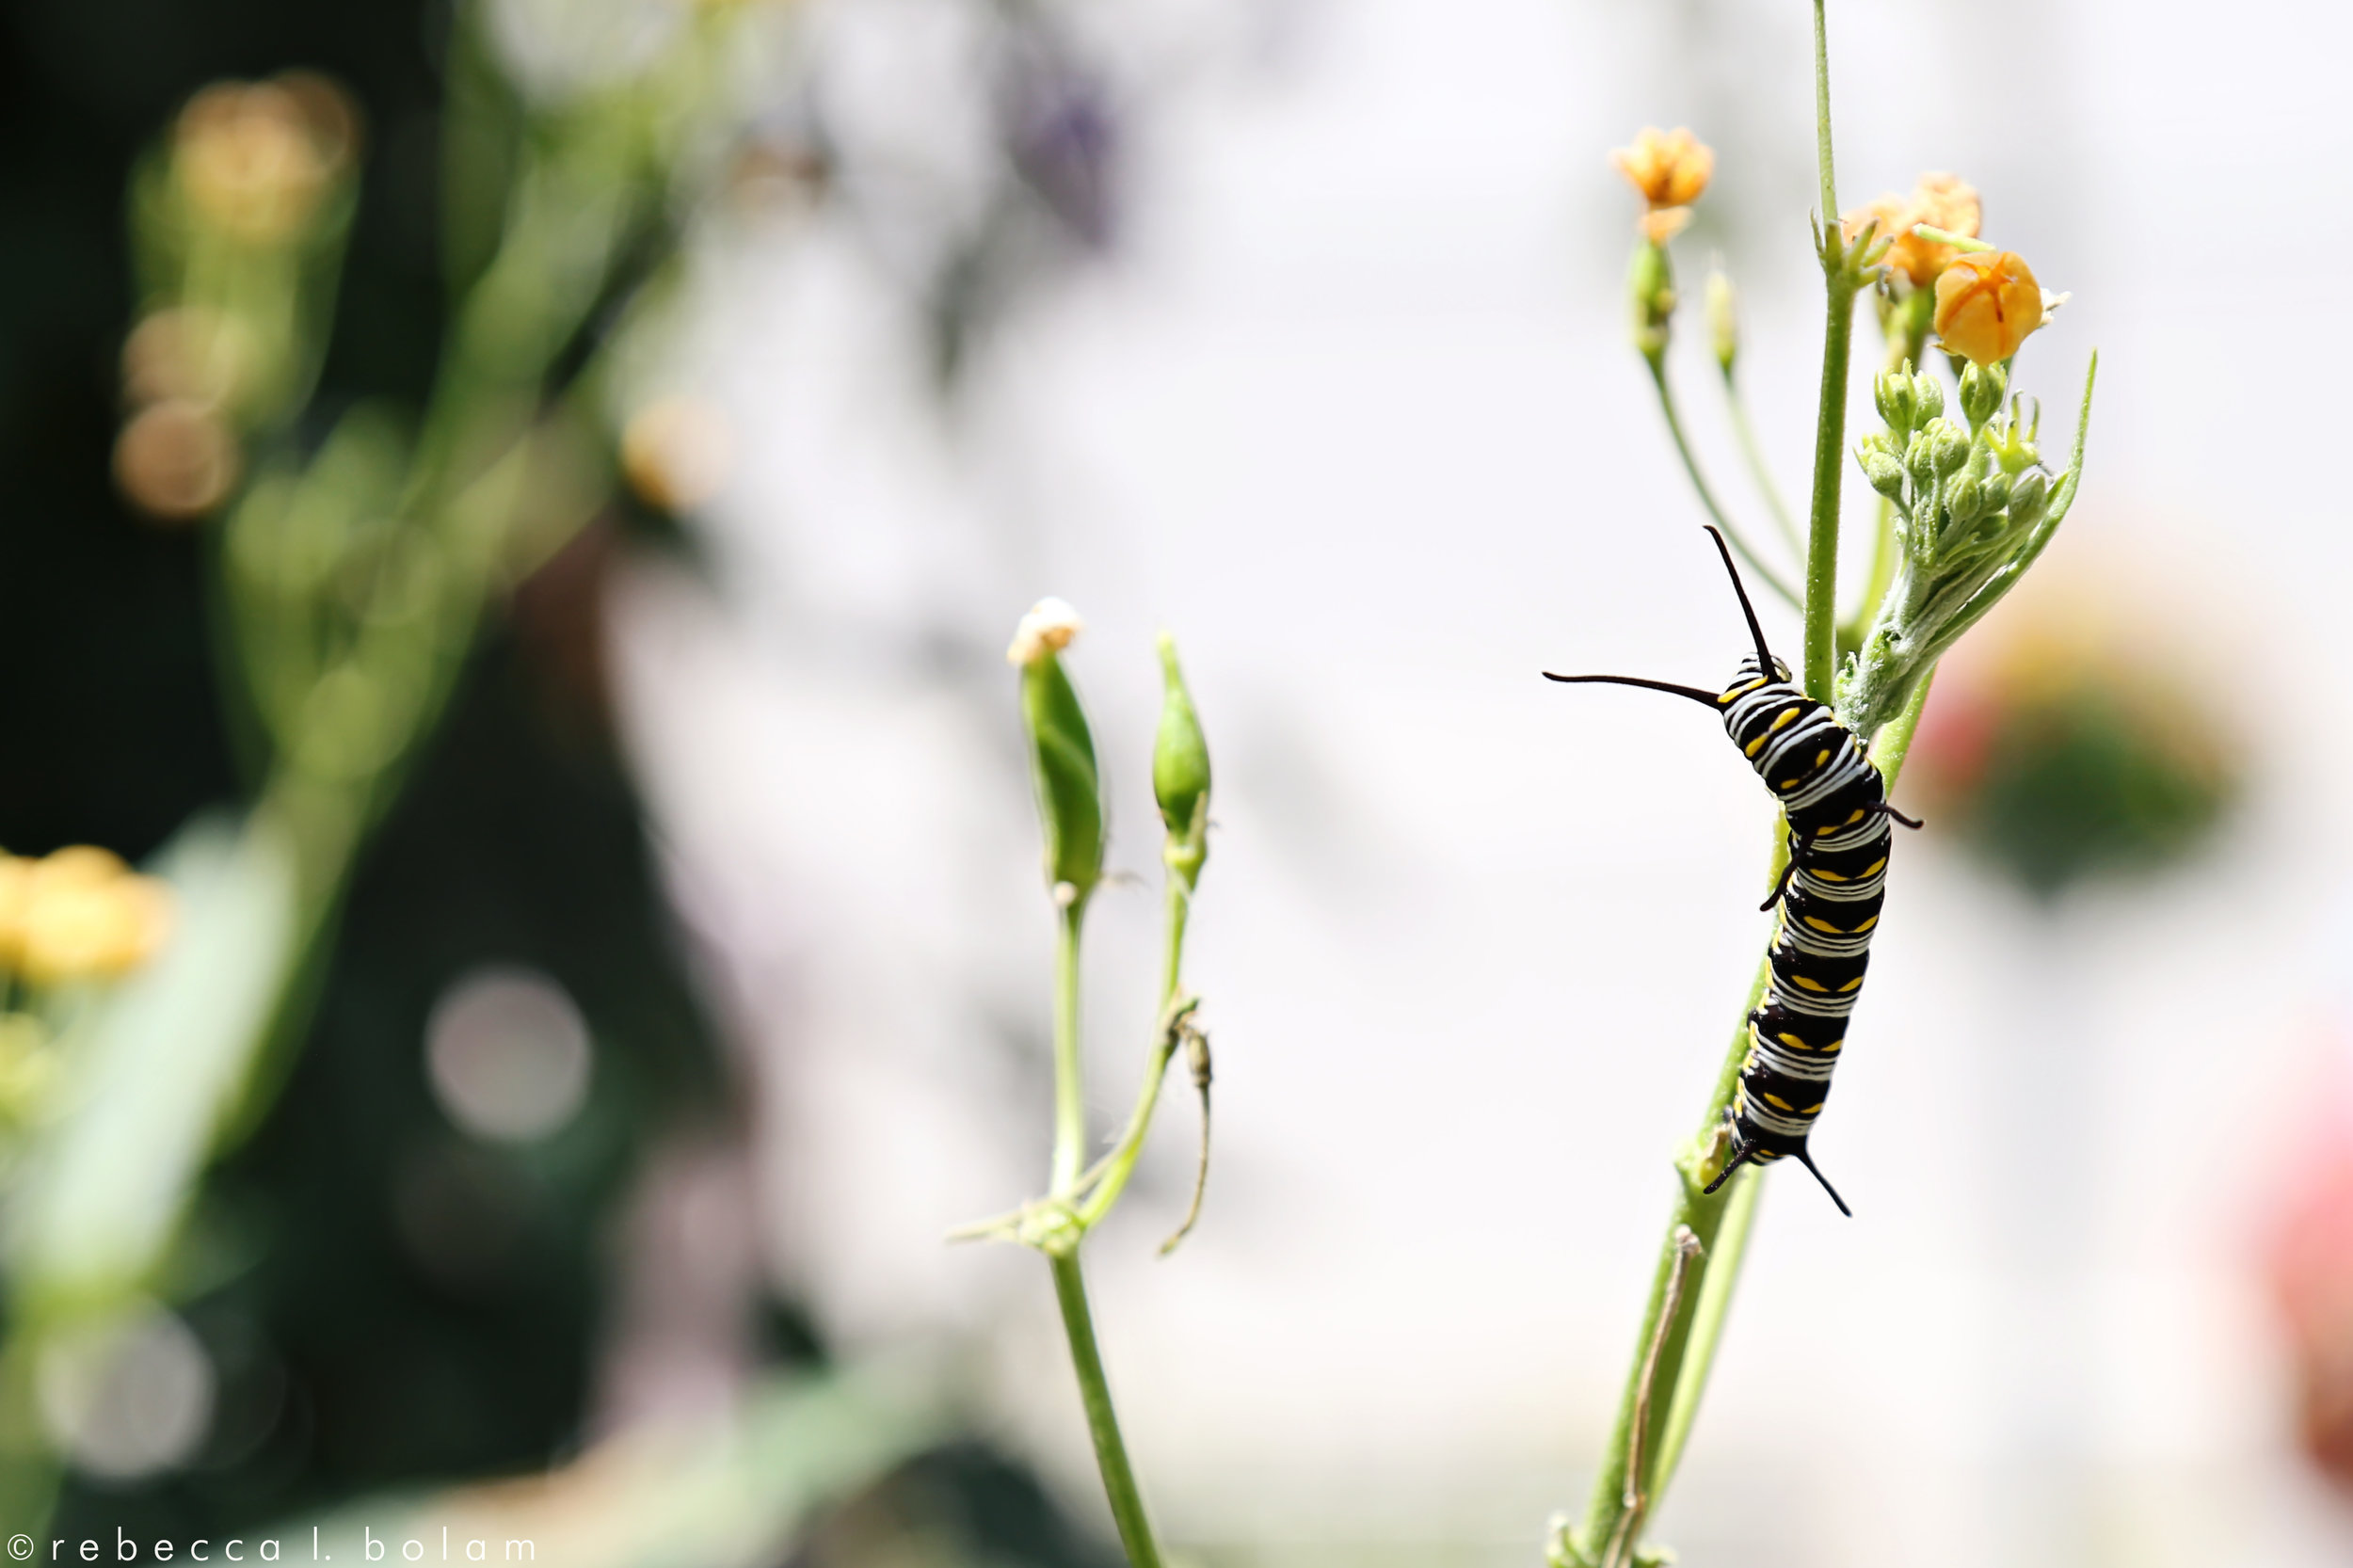 Caterpillar on Green Stem.jpg